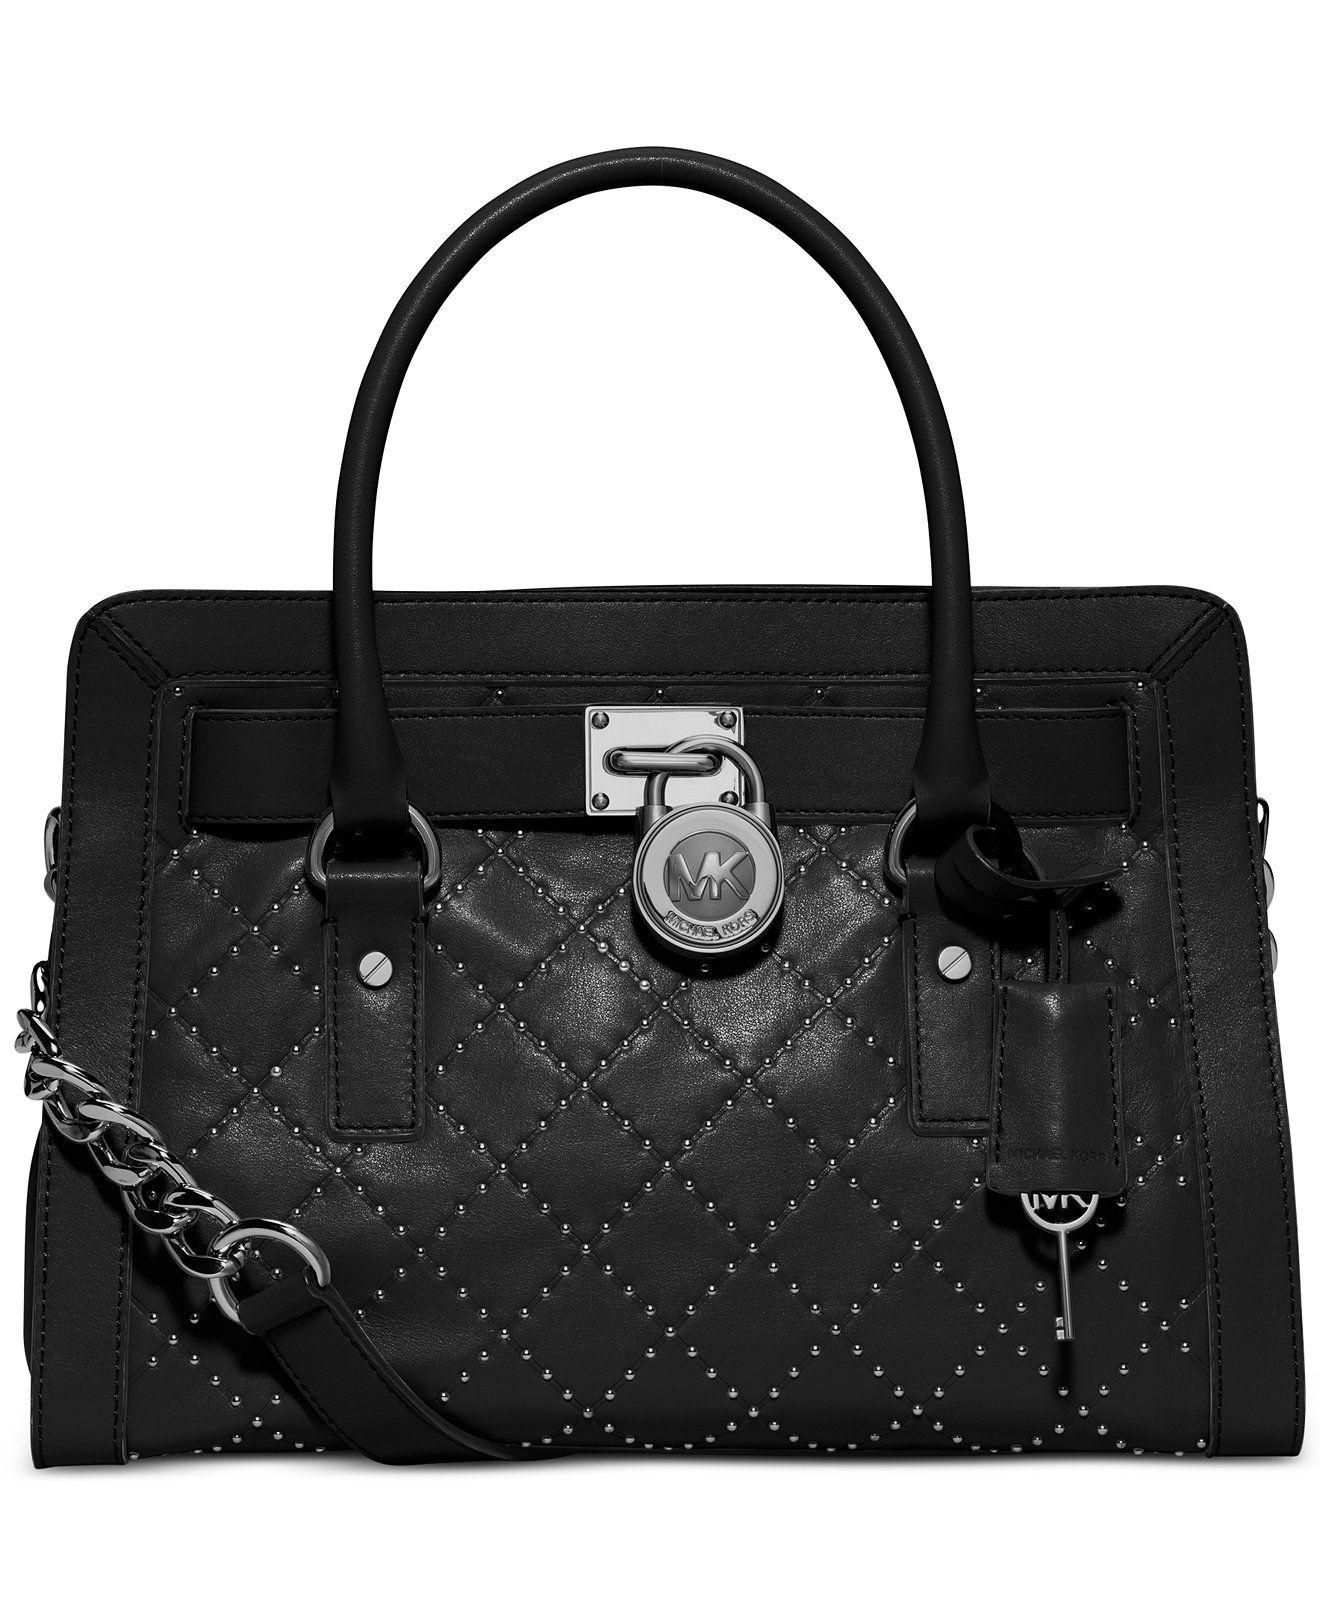 75a532c3caee MICHAEL Michael Kors Hamilton Micro Stud East West Satchel Black Cow Leather  Tufted Chain Shoulder Handbag Designer Fashion